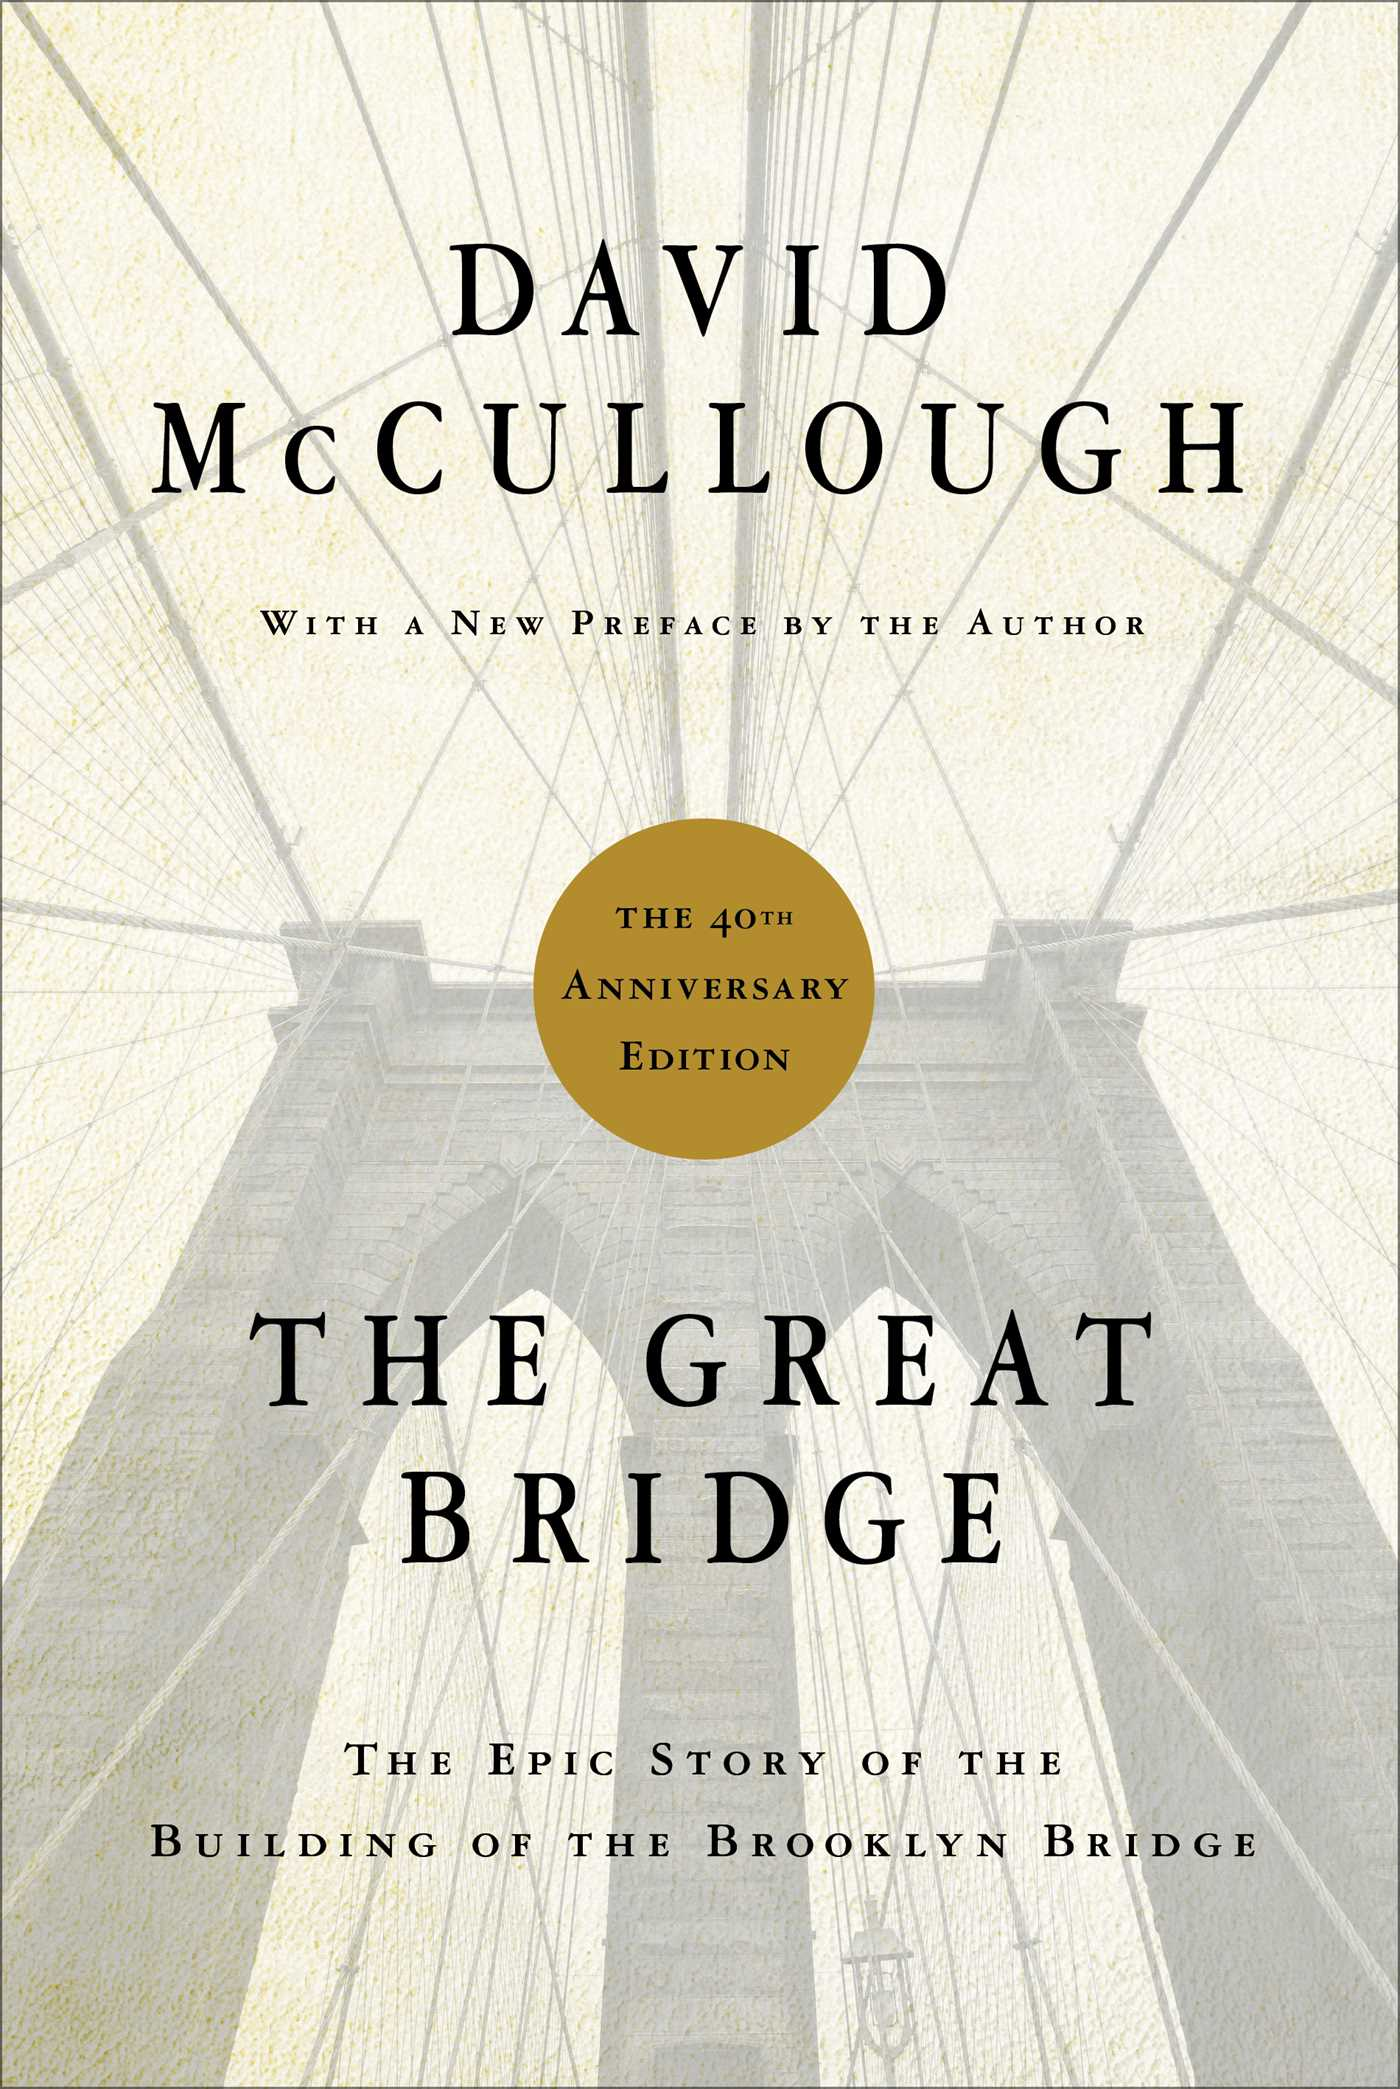 The great bridge 9781451683233 hr